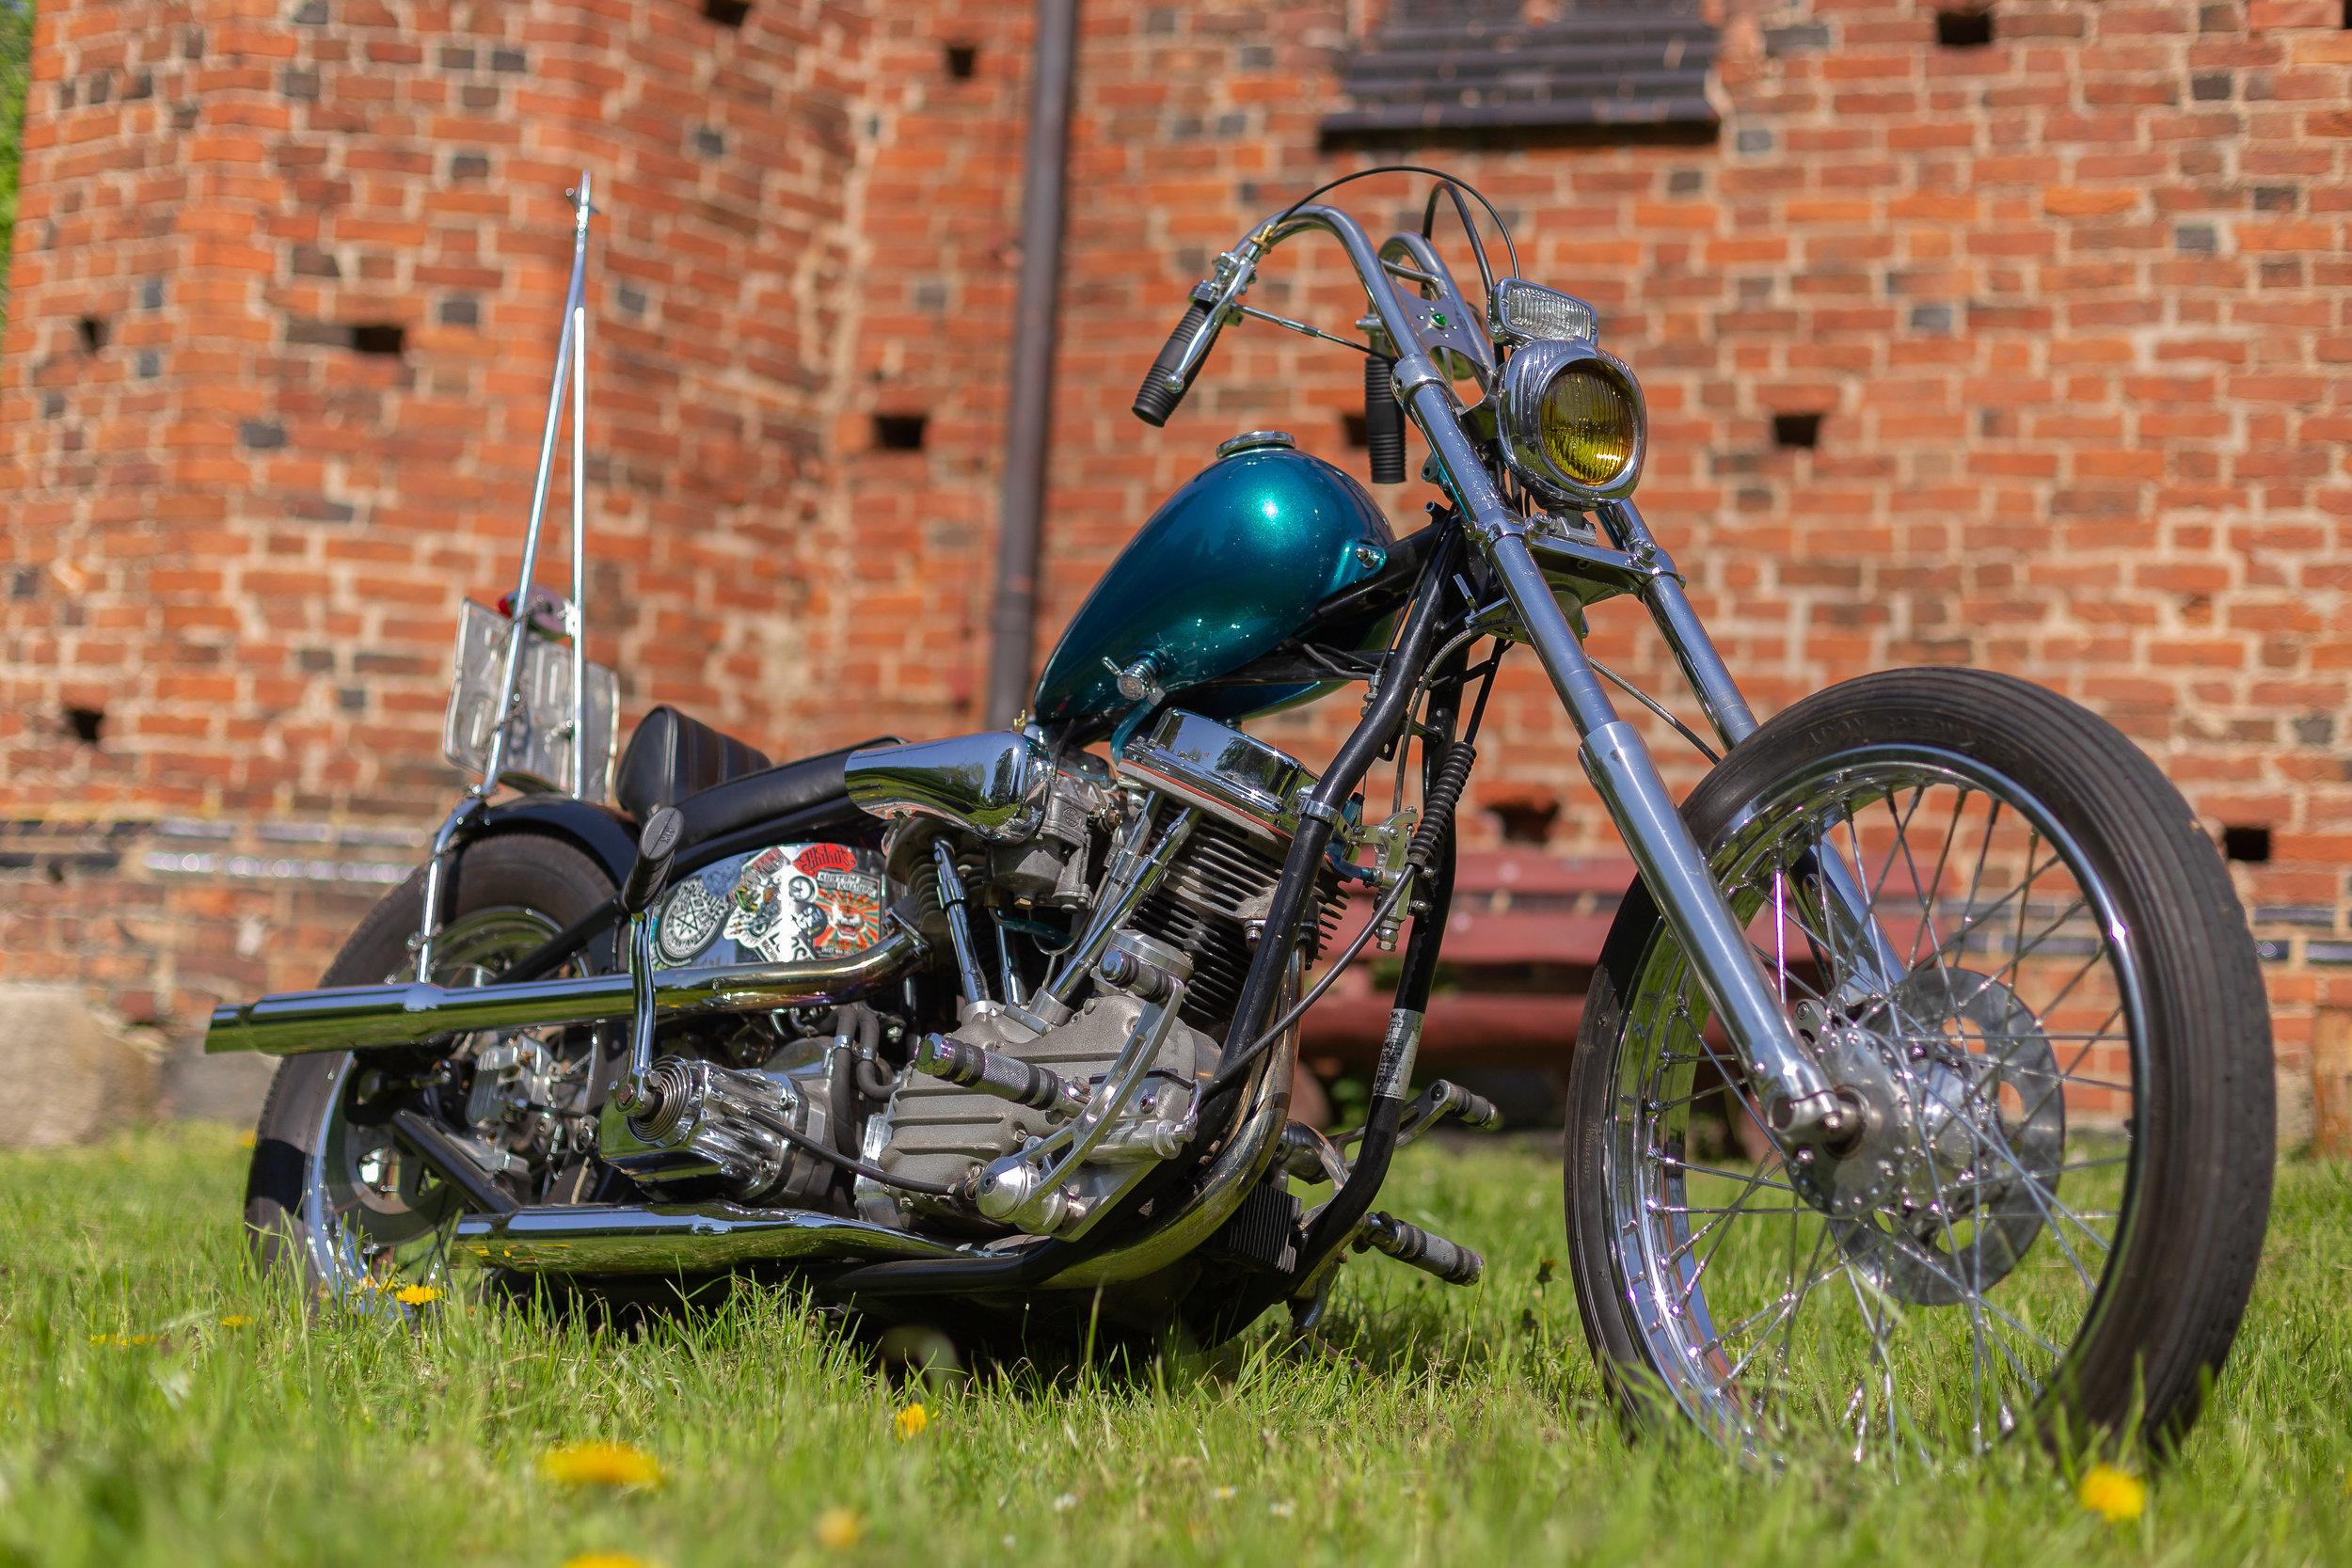 (c) Stefan Weidner Fotografie_Toxic Bikes_Karls Ofen_10-05-2018_IMG-0131.jpg